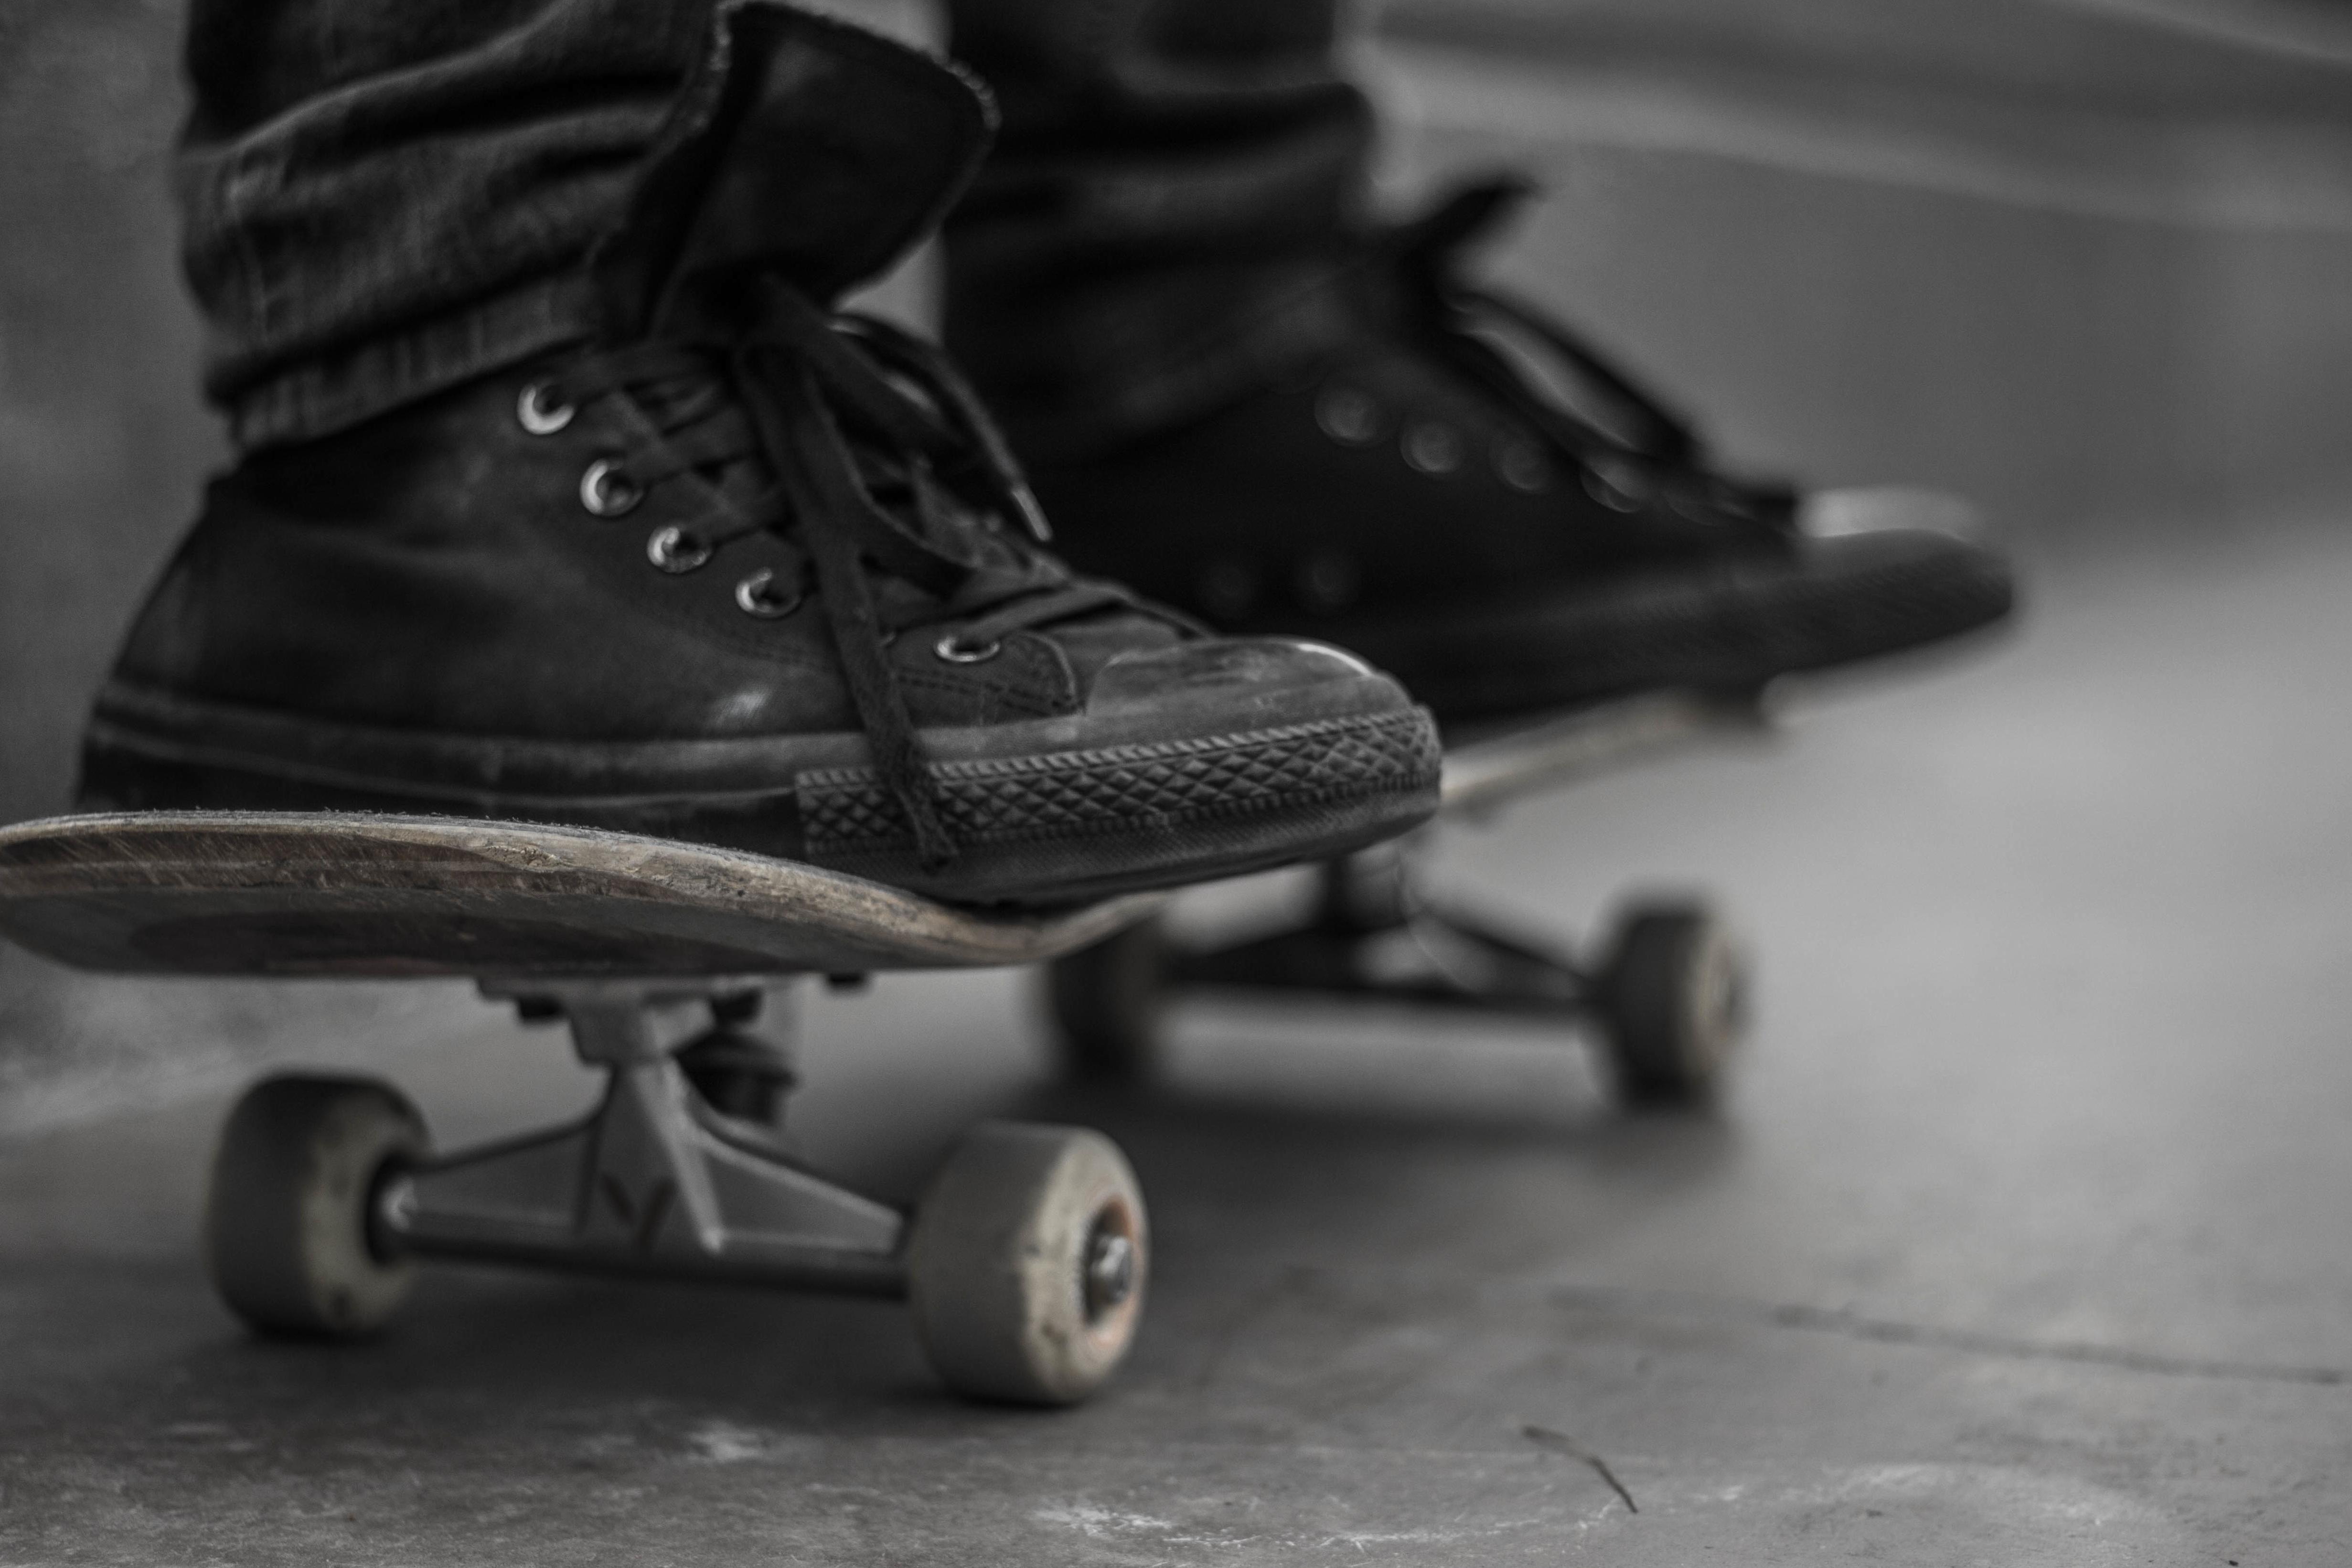 Free picture skate footwear shoe monochrome asphalt